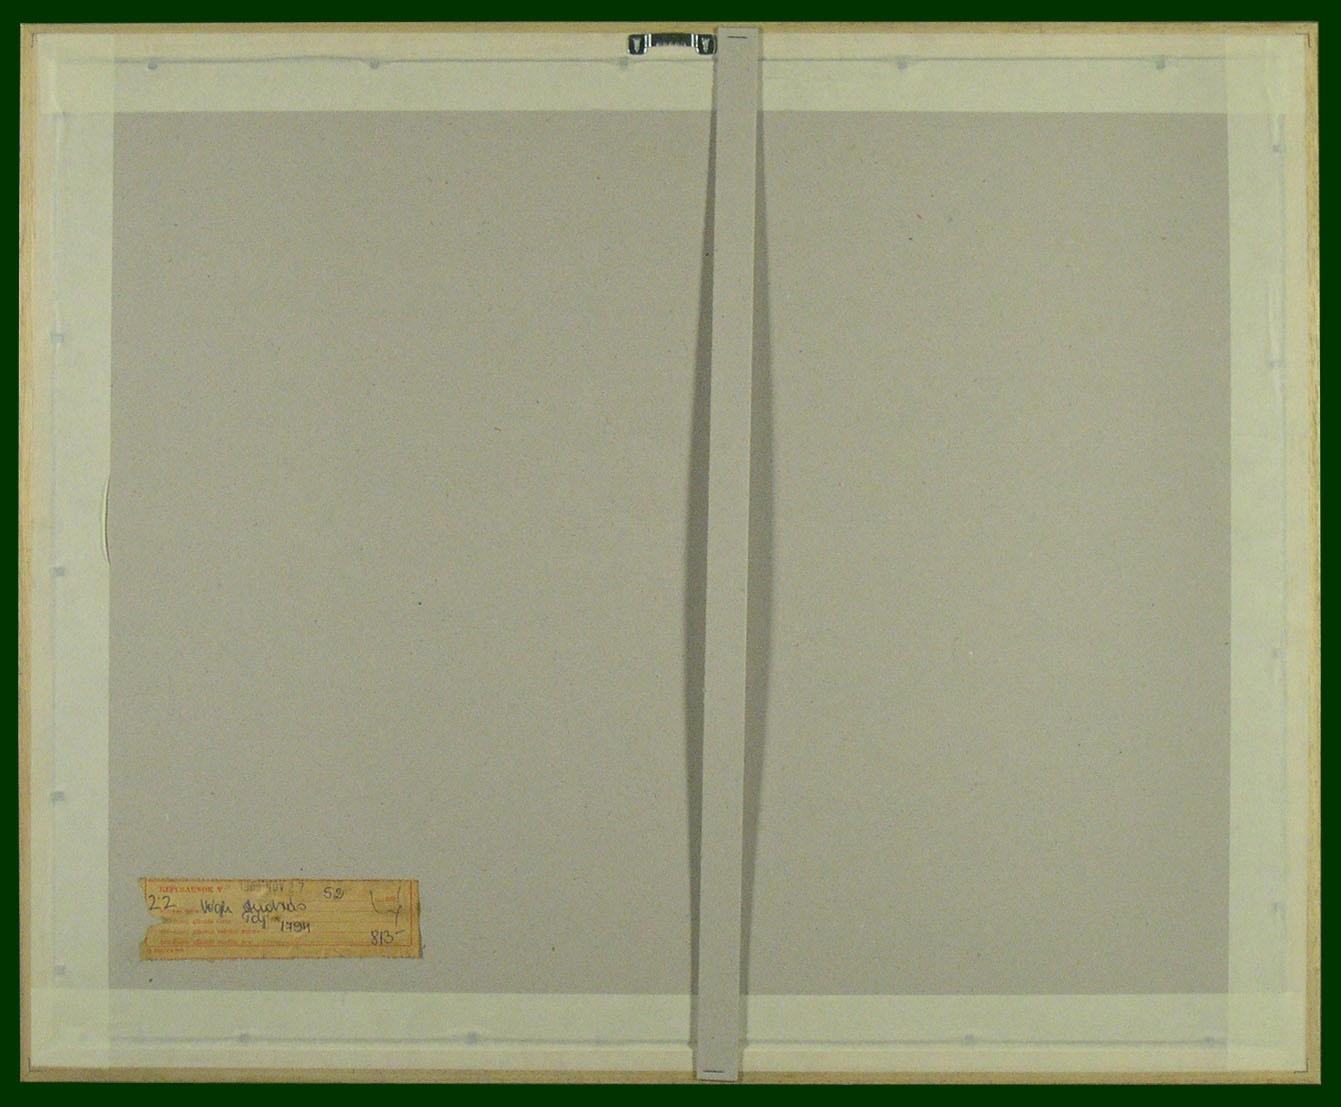 44-19hat.JPG (1341×1107)